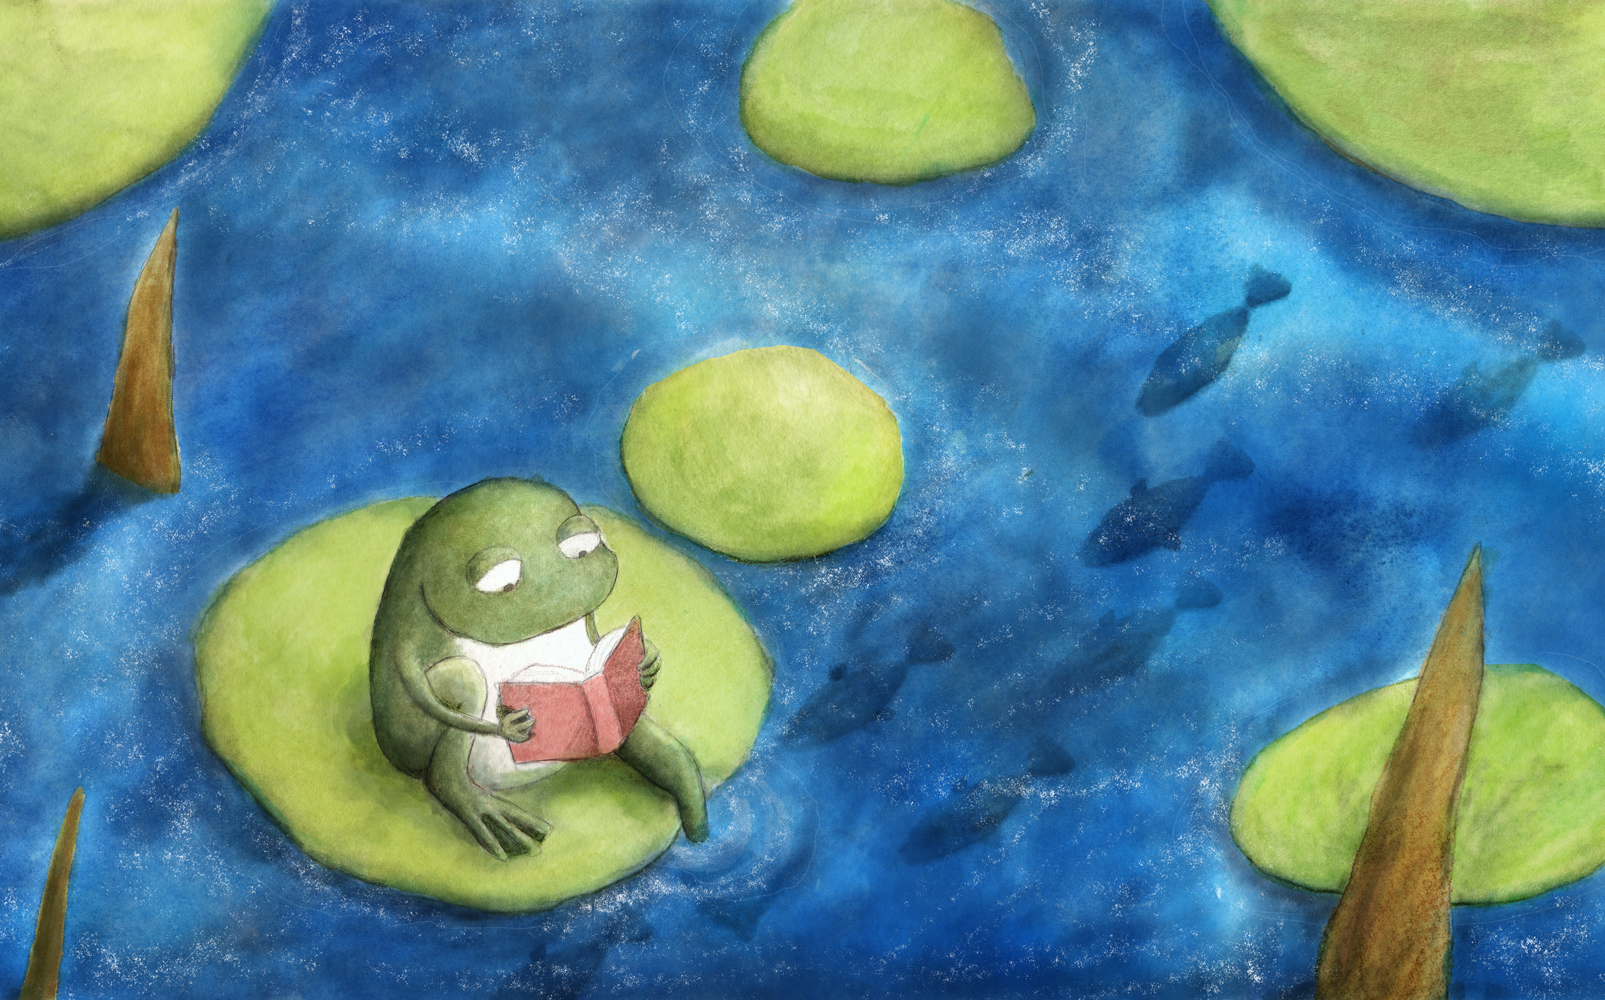 Frog_1605x1000.jpg